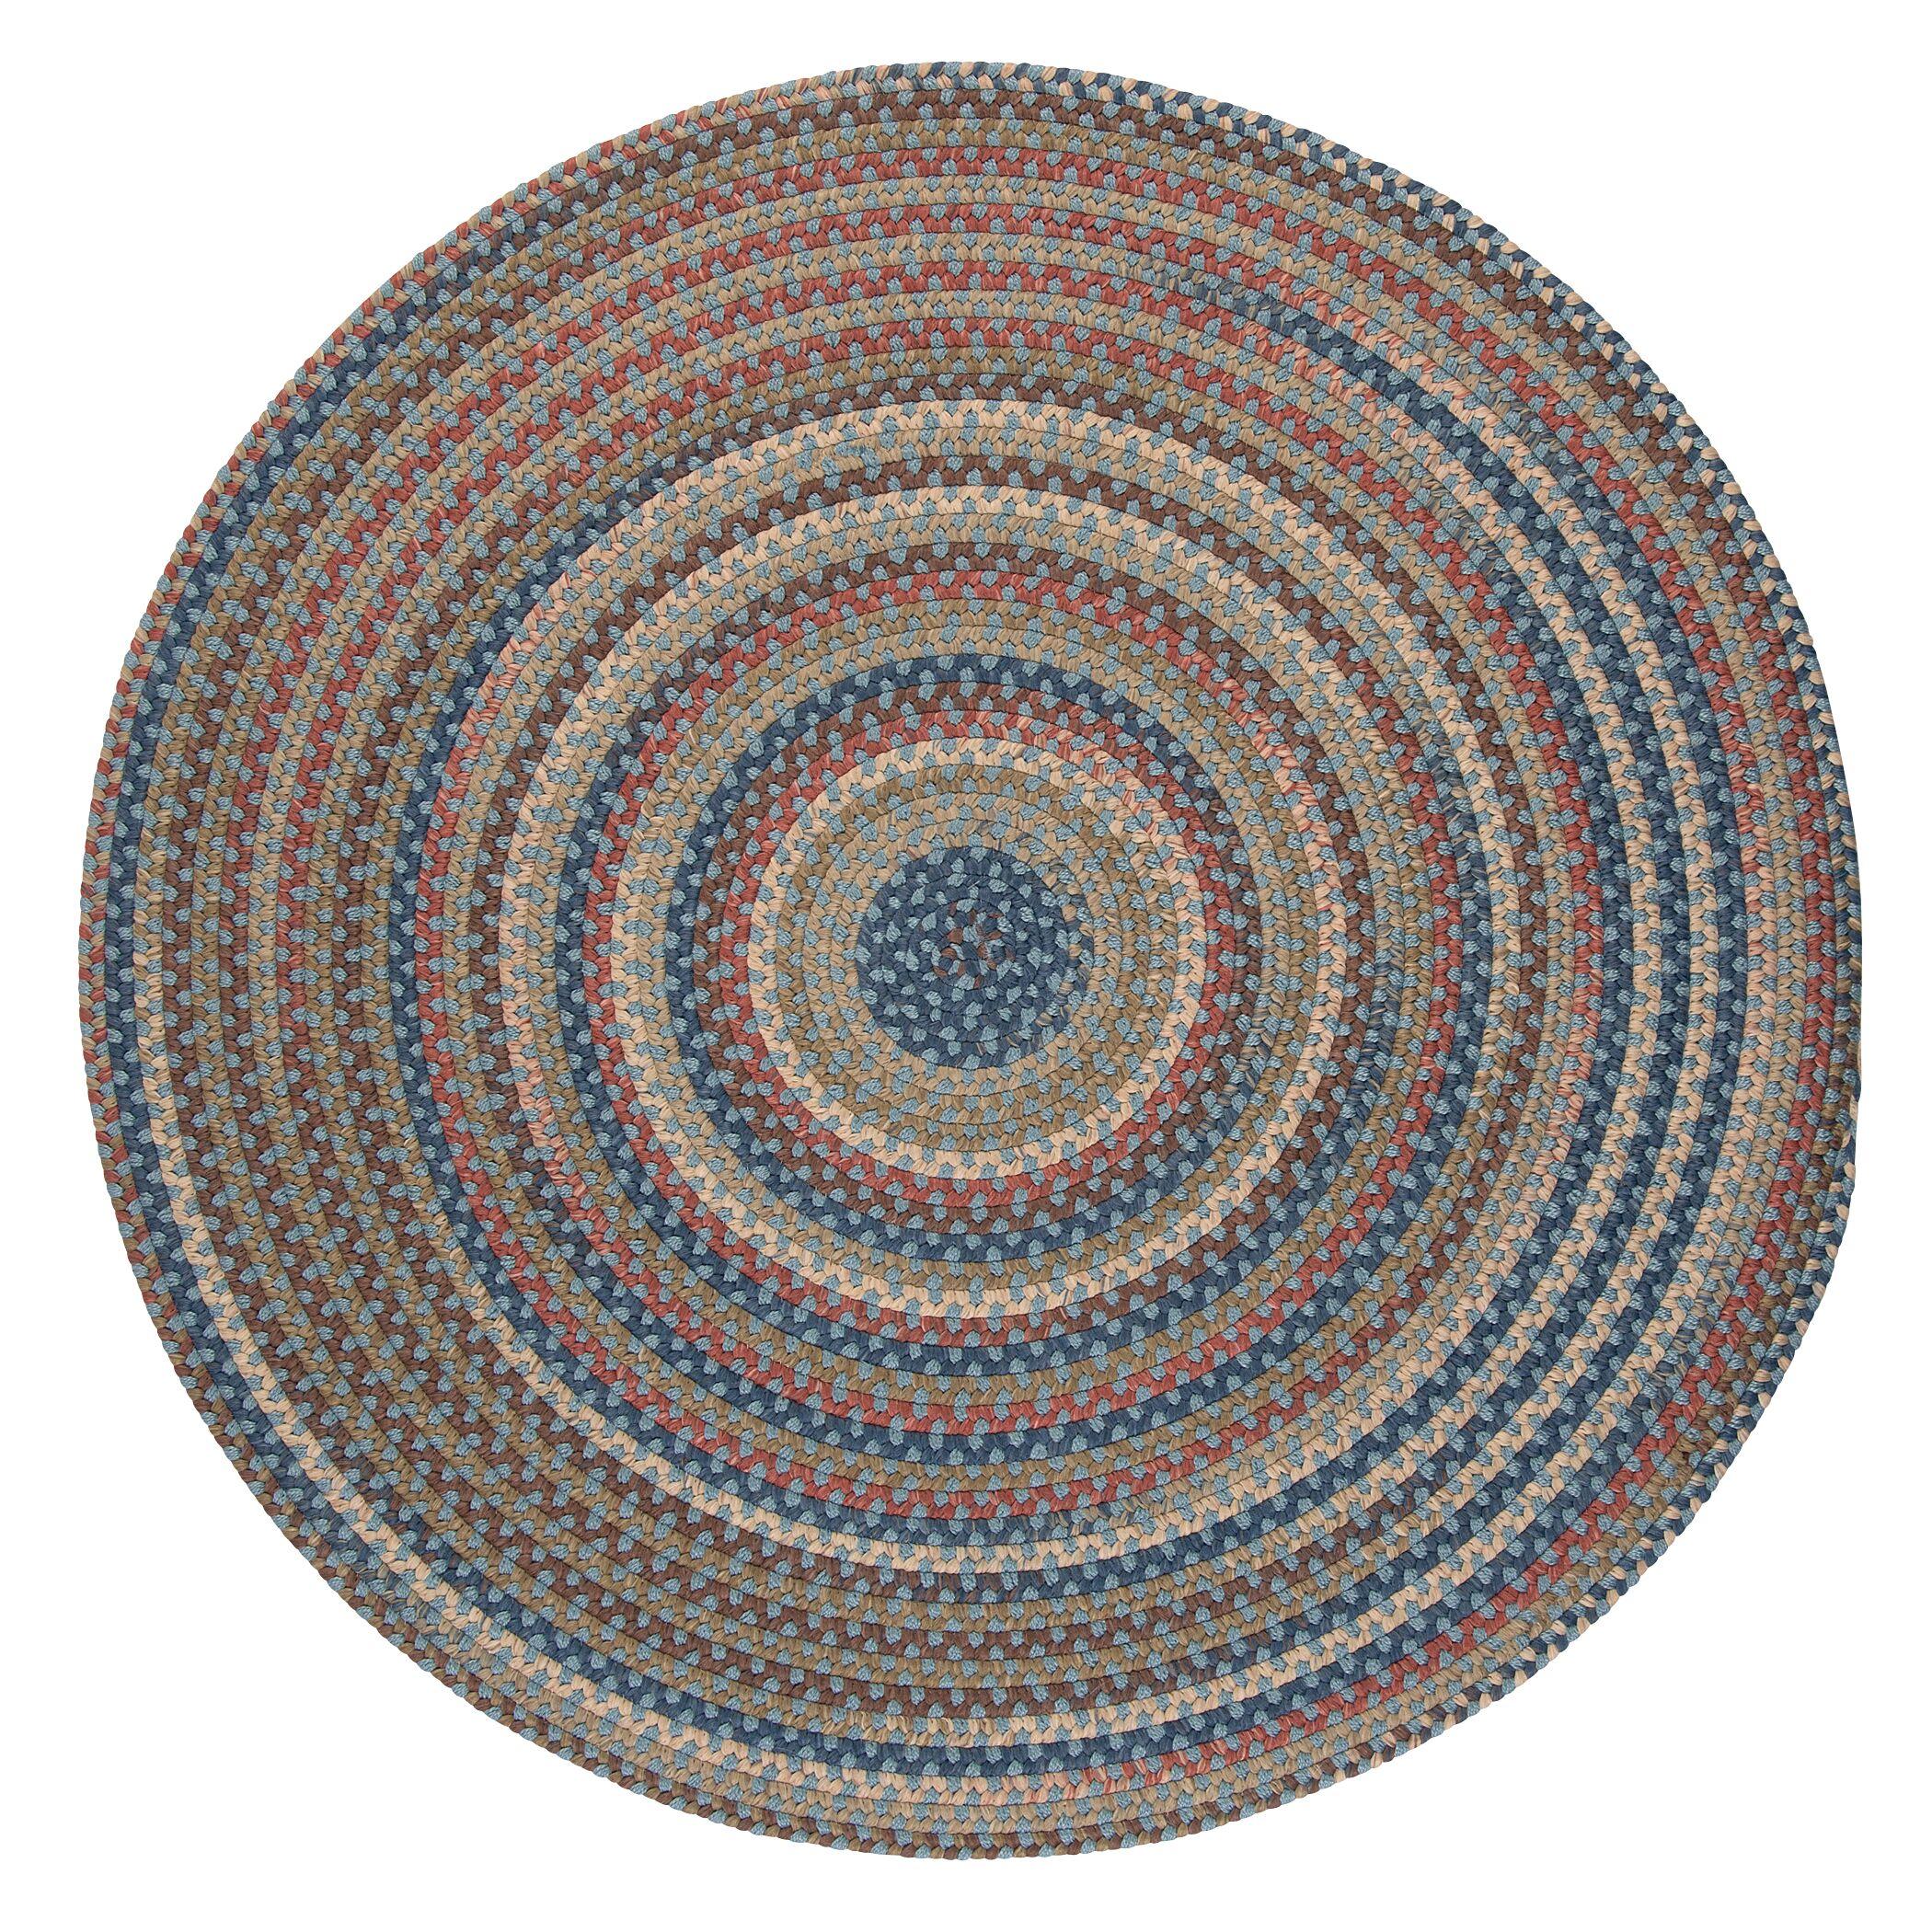 Kipton Light Blue Area Rug Rug Size: Round 6'